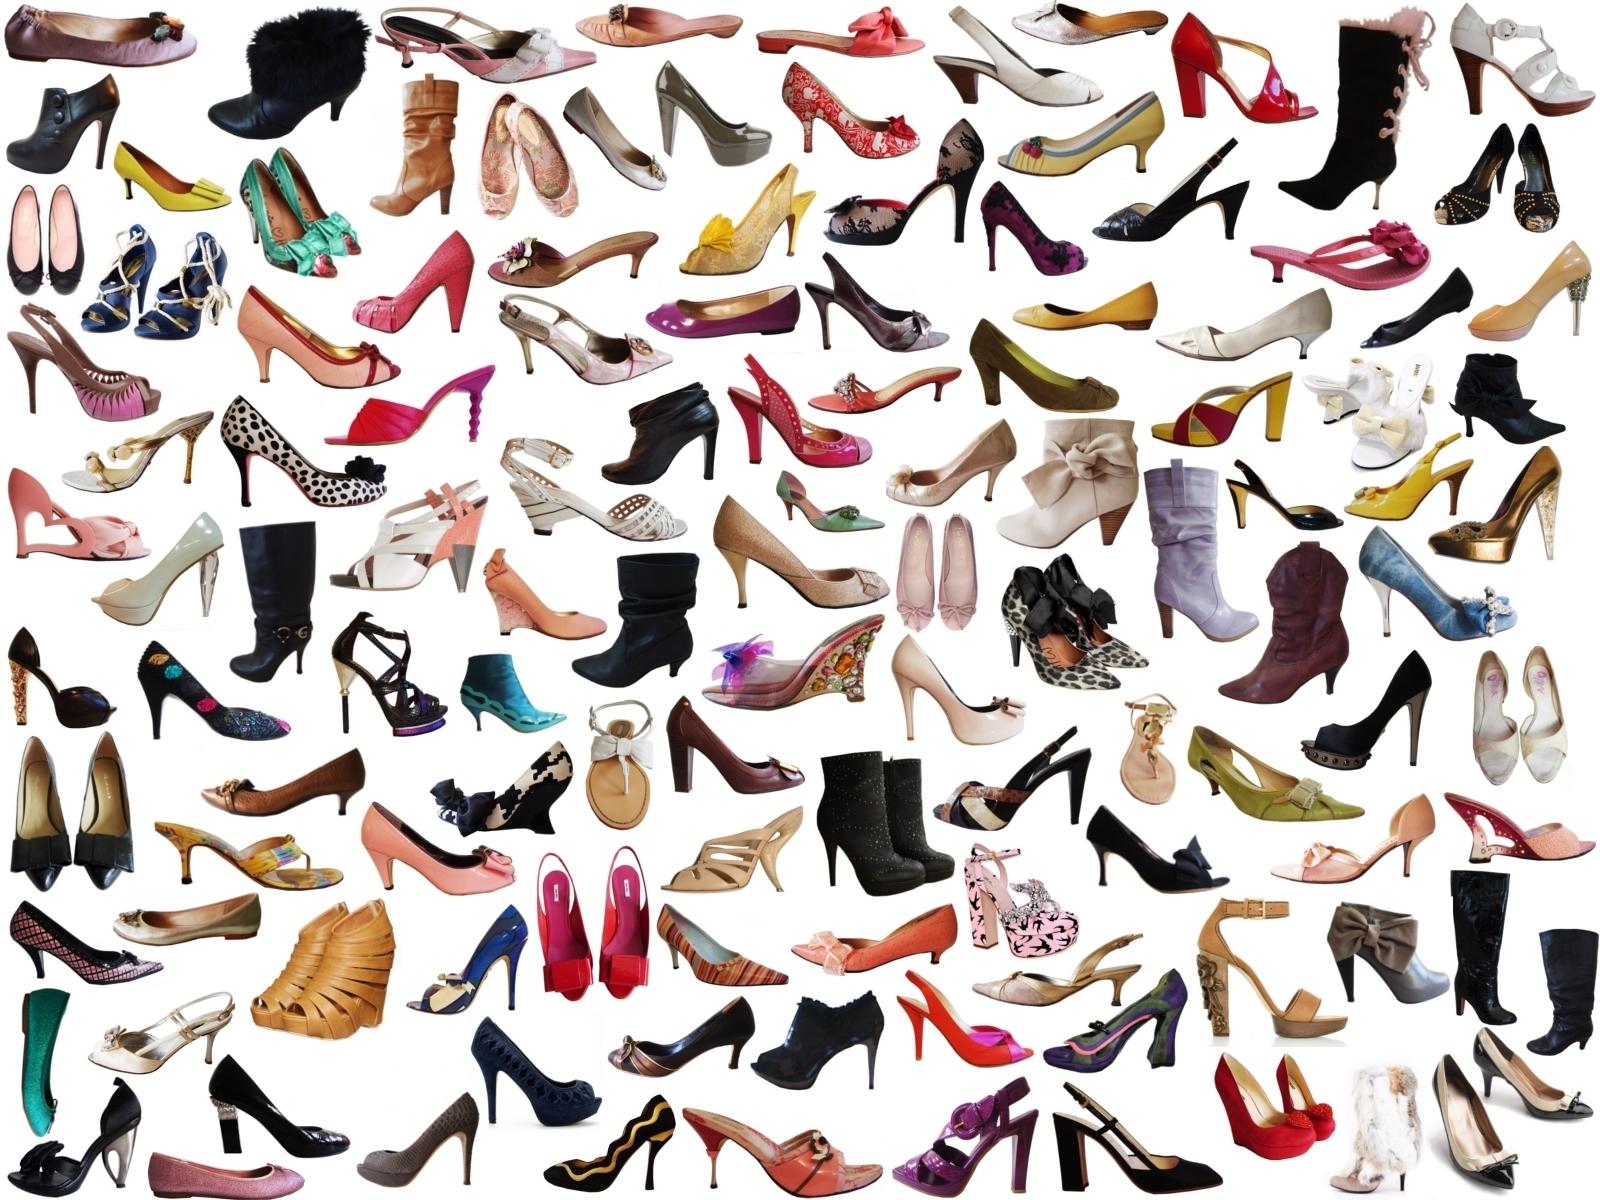 https://fashionforensicafrica.me/2013/11/19/shoestoresonfacebook/